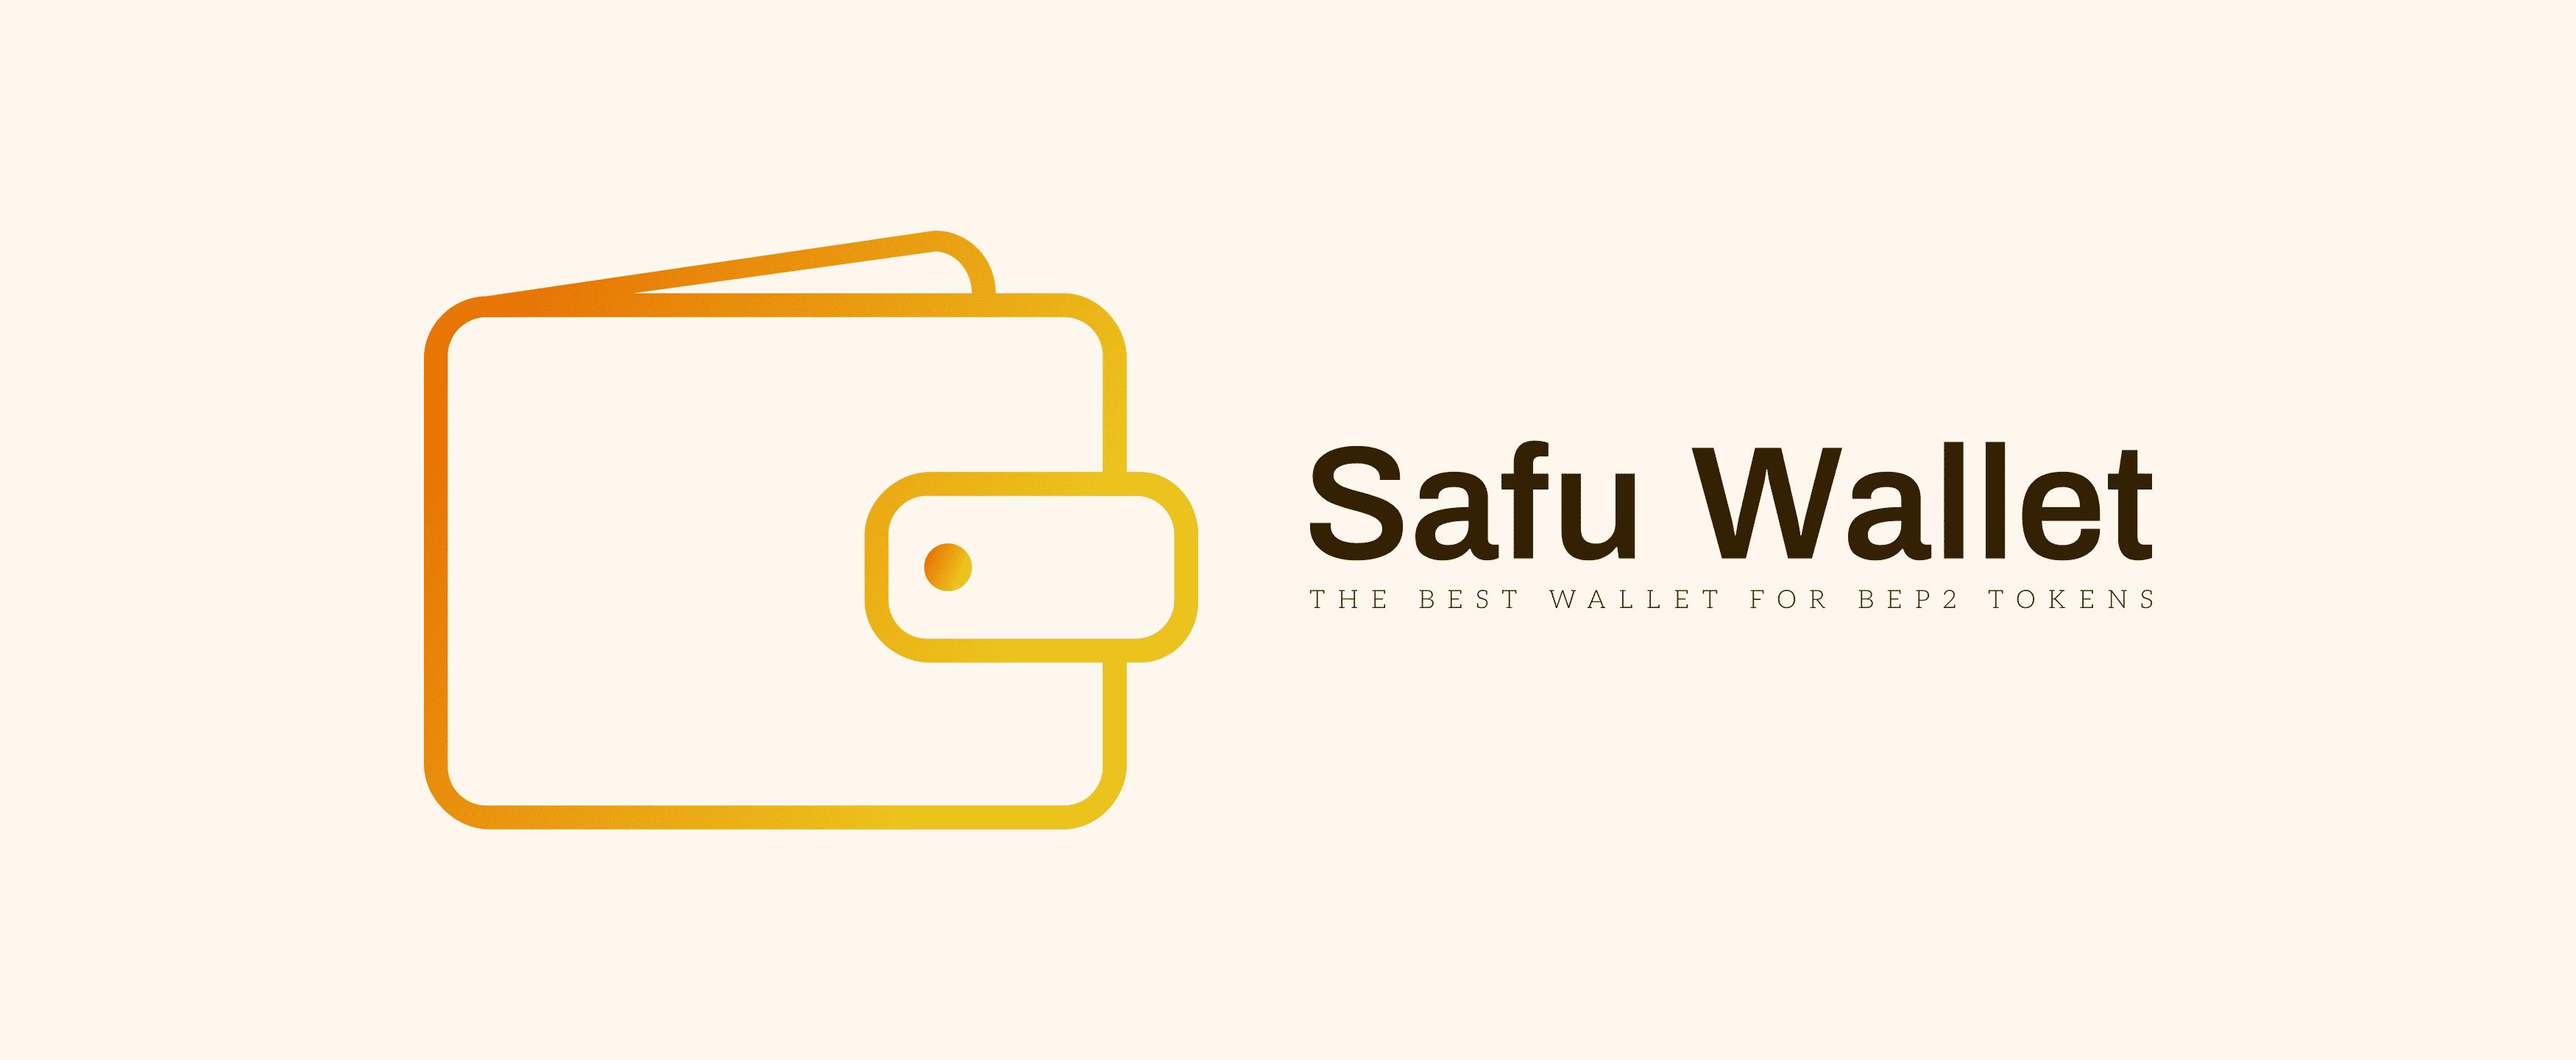 SAFU Wallet Gets Hacked, Binance Warns Community Members